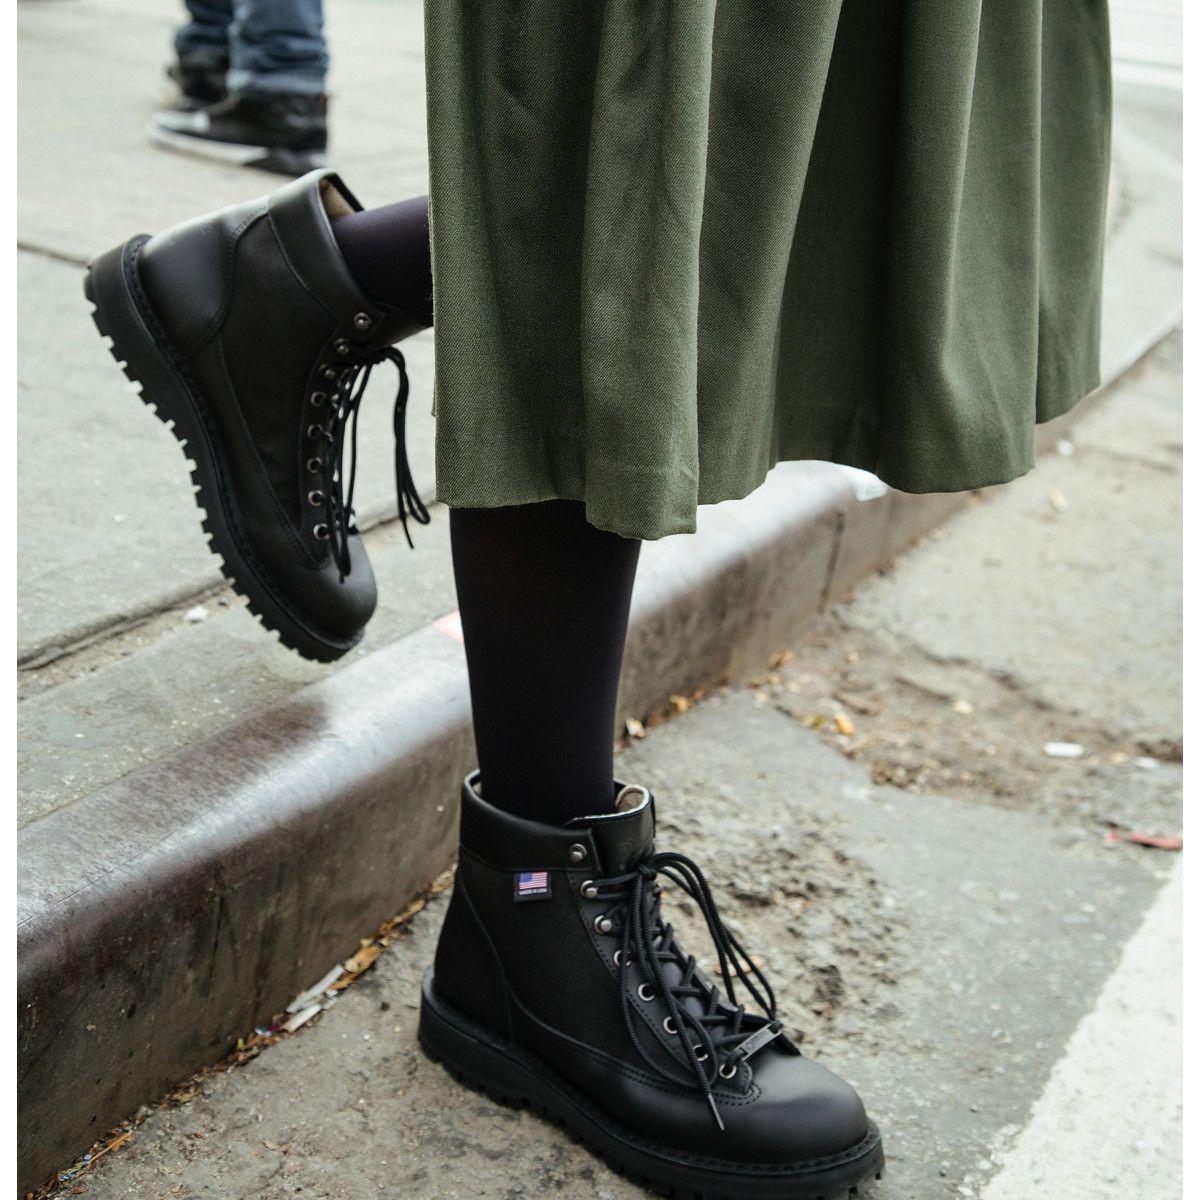 28+ Black combat boots women ideas information